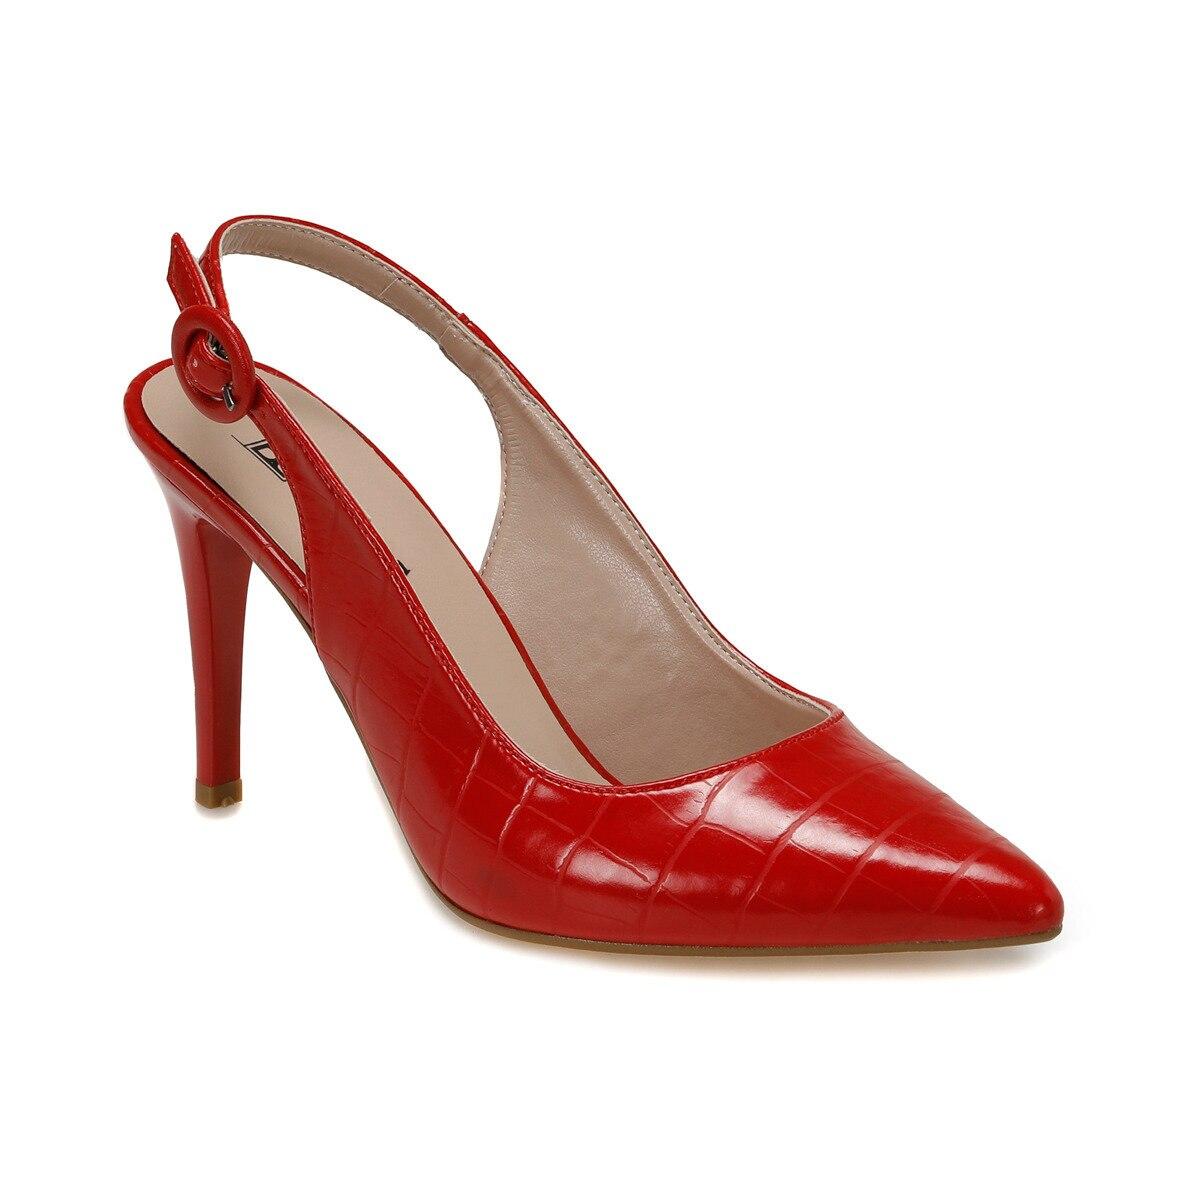 FLO FİNN Red Women 'S Heels Shoes BUTIGO